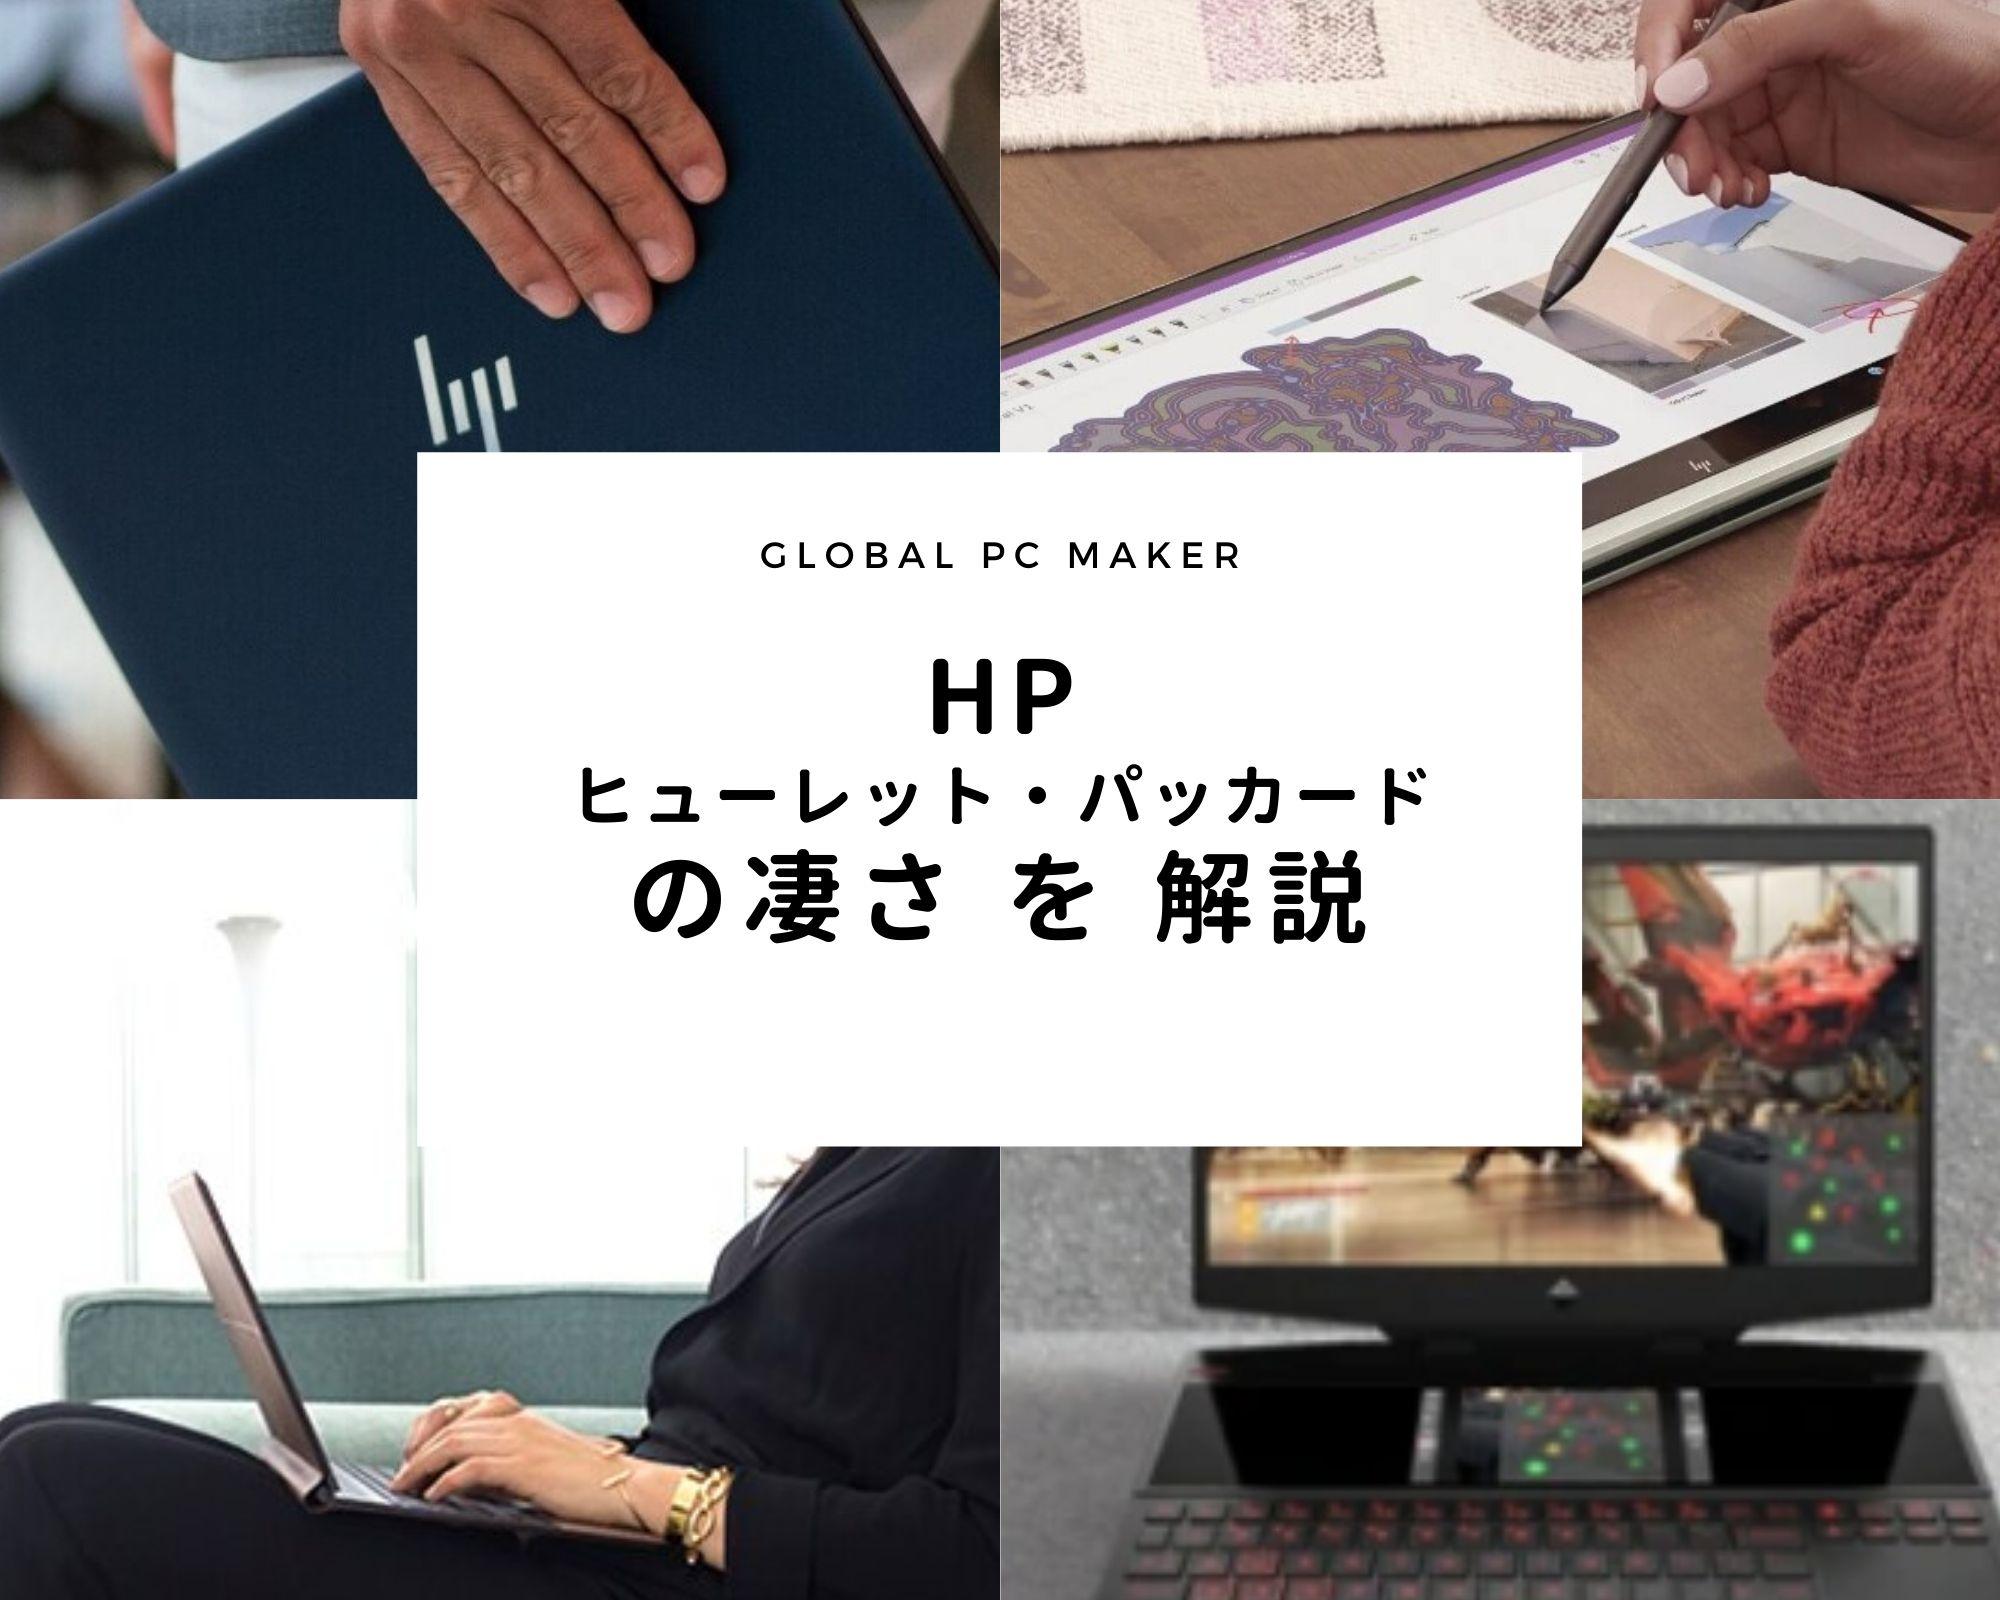 HP(ヒューレットパッカード)の特徴と、ノートパソコン評価一覧